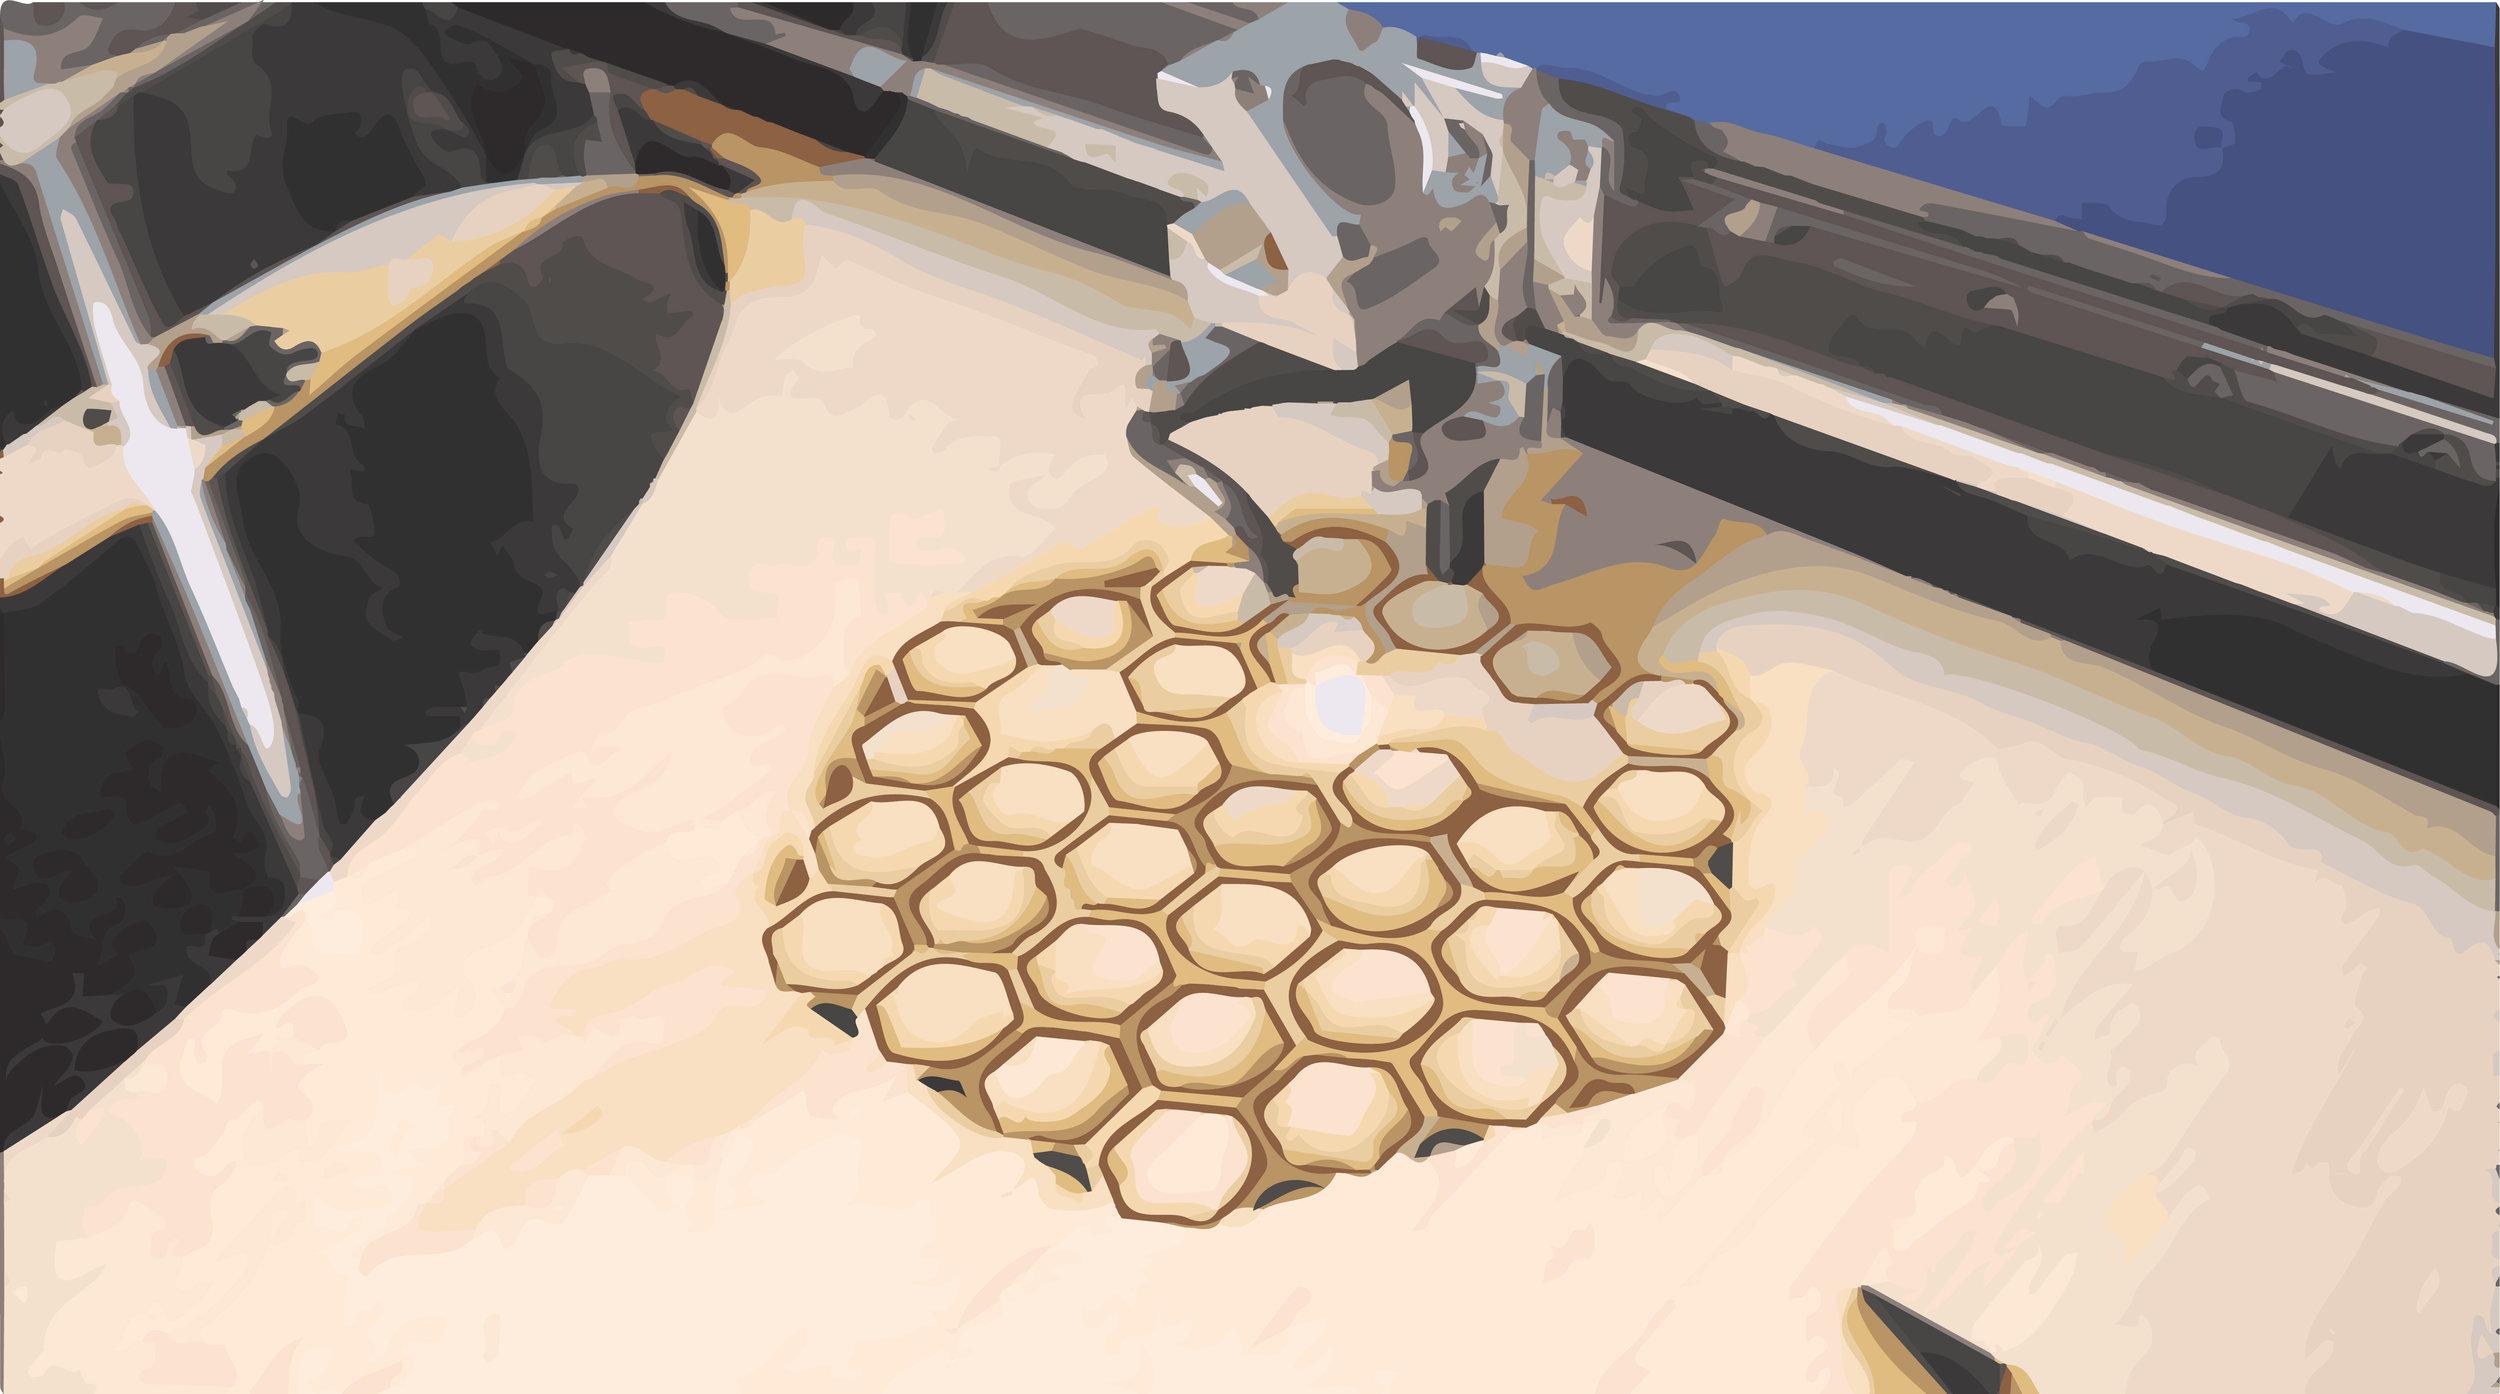 lasercutting image.jpg